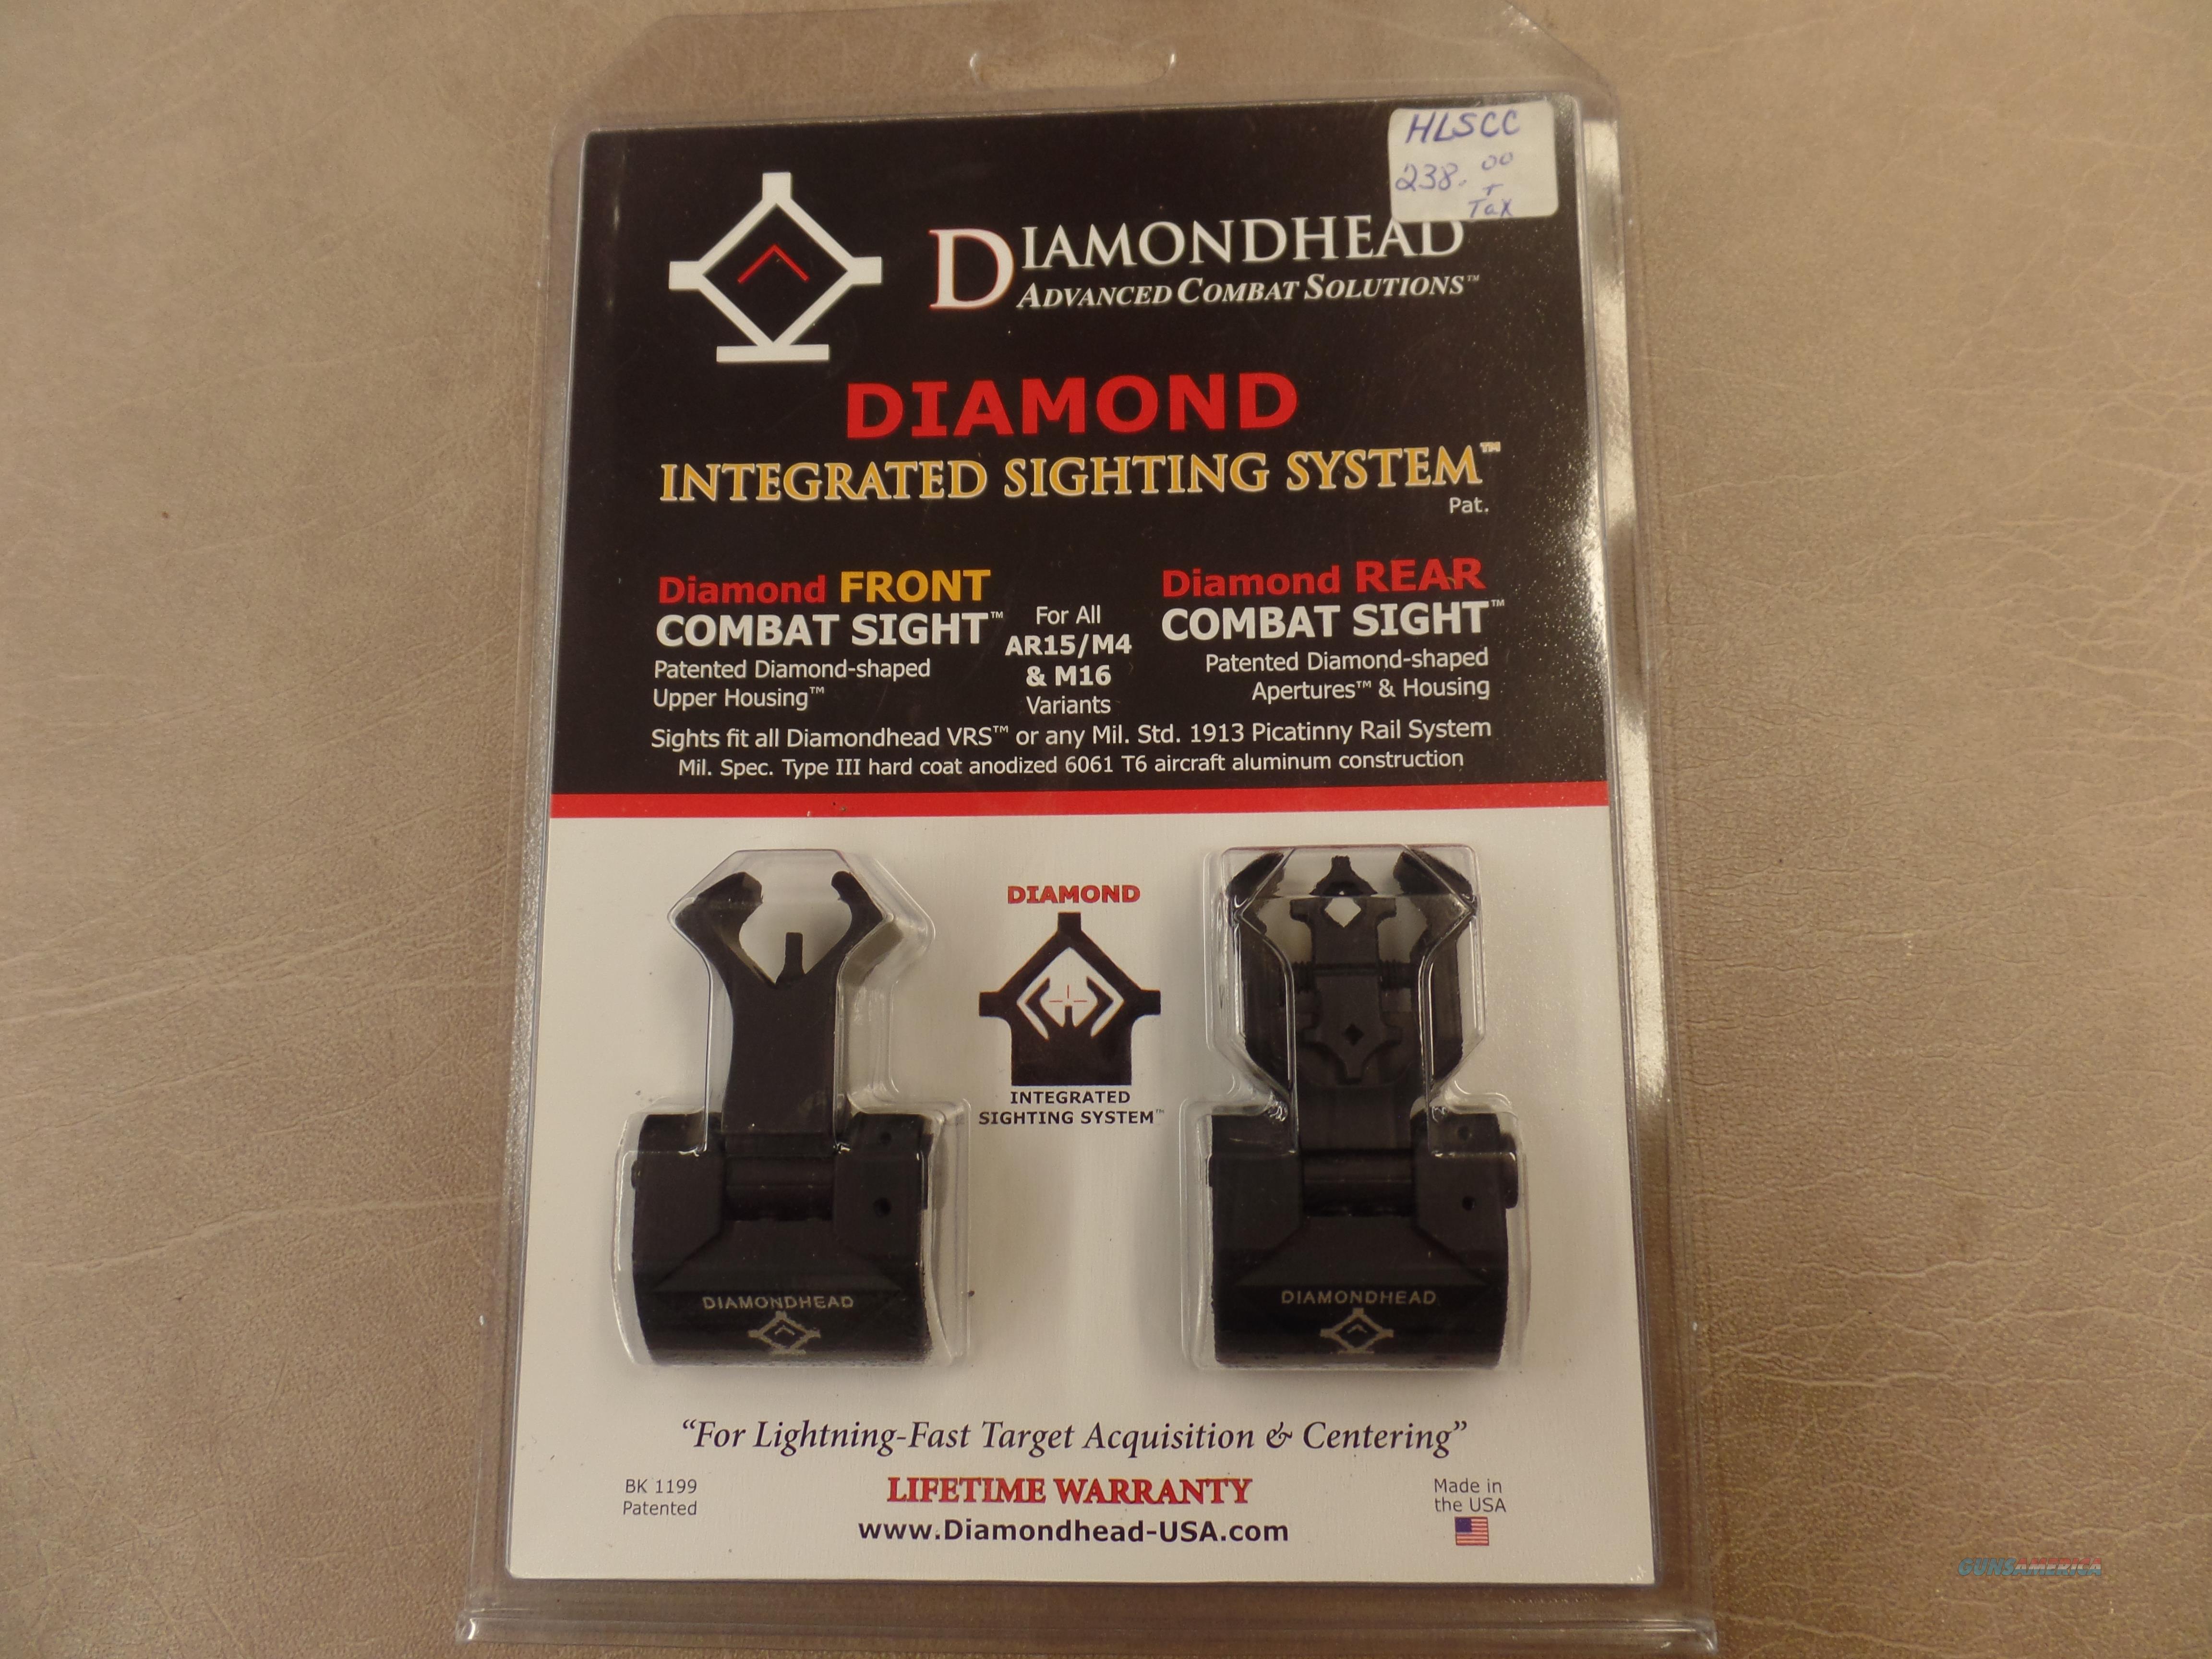 Diamondhead Diamond Integrated Sighting System ( Combat Sight )  Non-Guns > Scopes/Mounts/Rings & Optics > Non-Scope Optics > Other